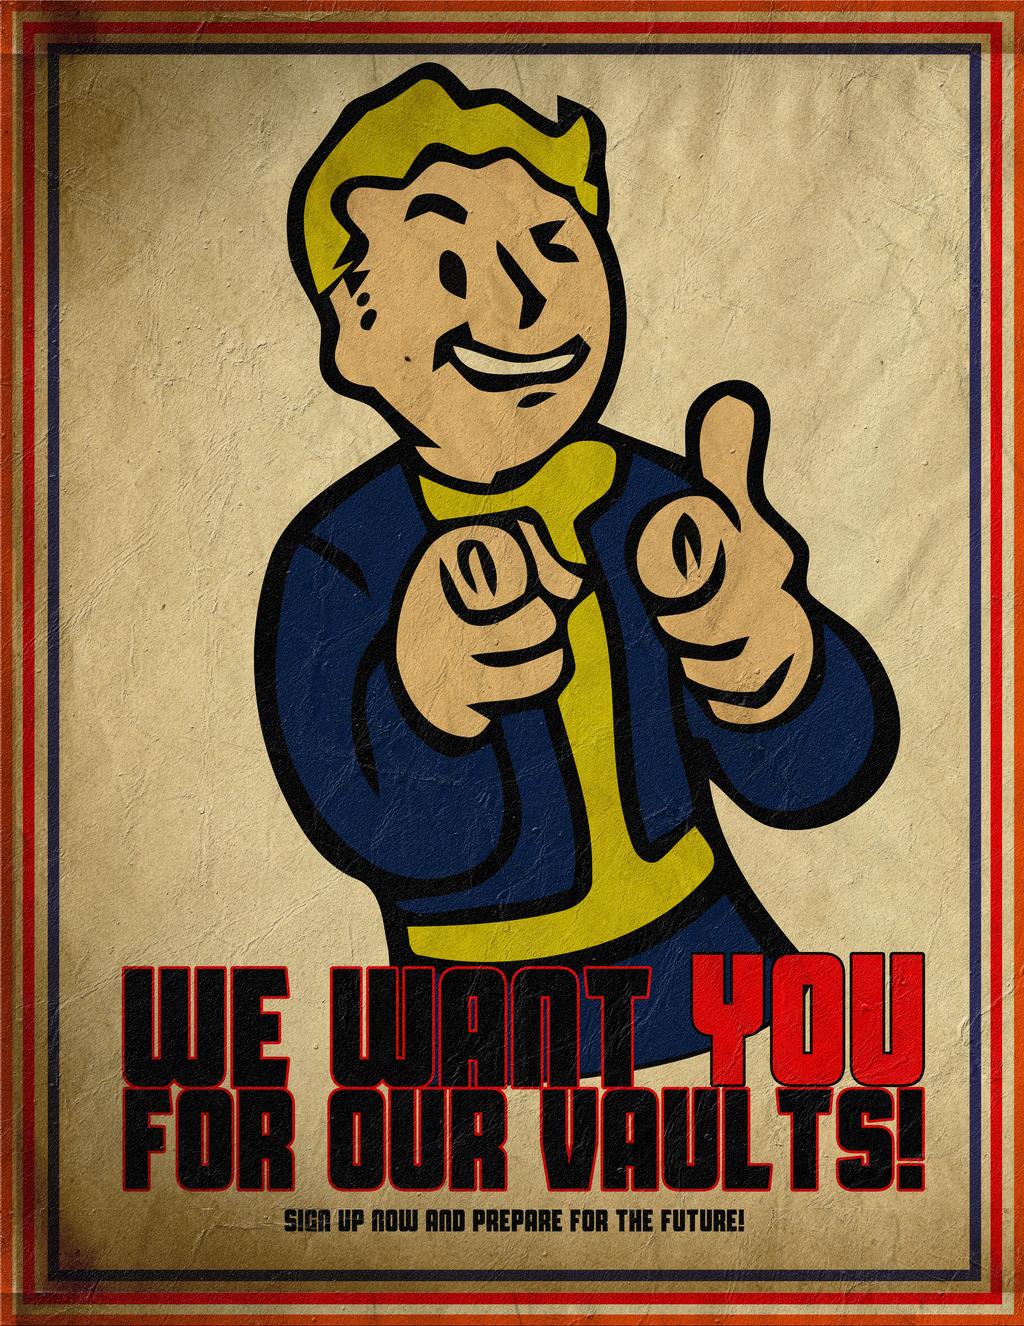 We Want You! Vault-Tec Vintage